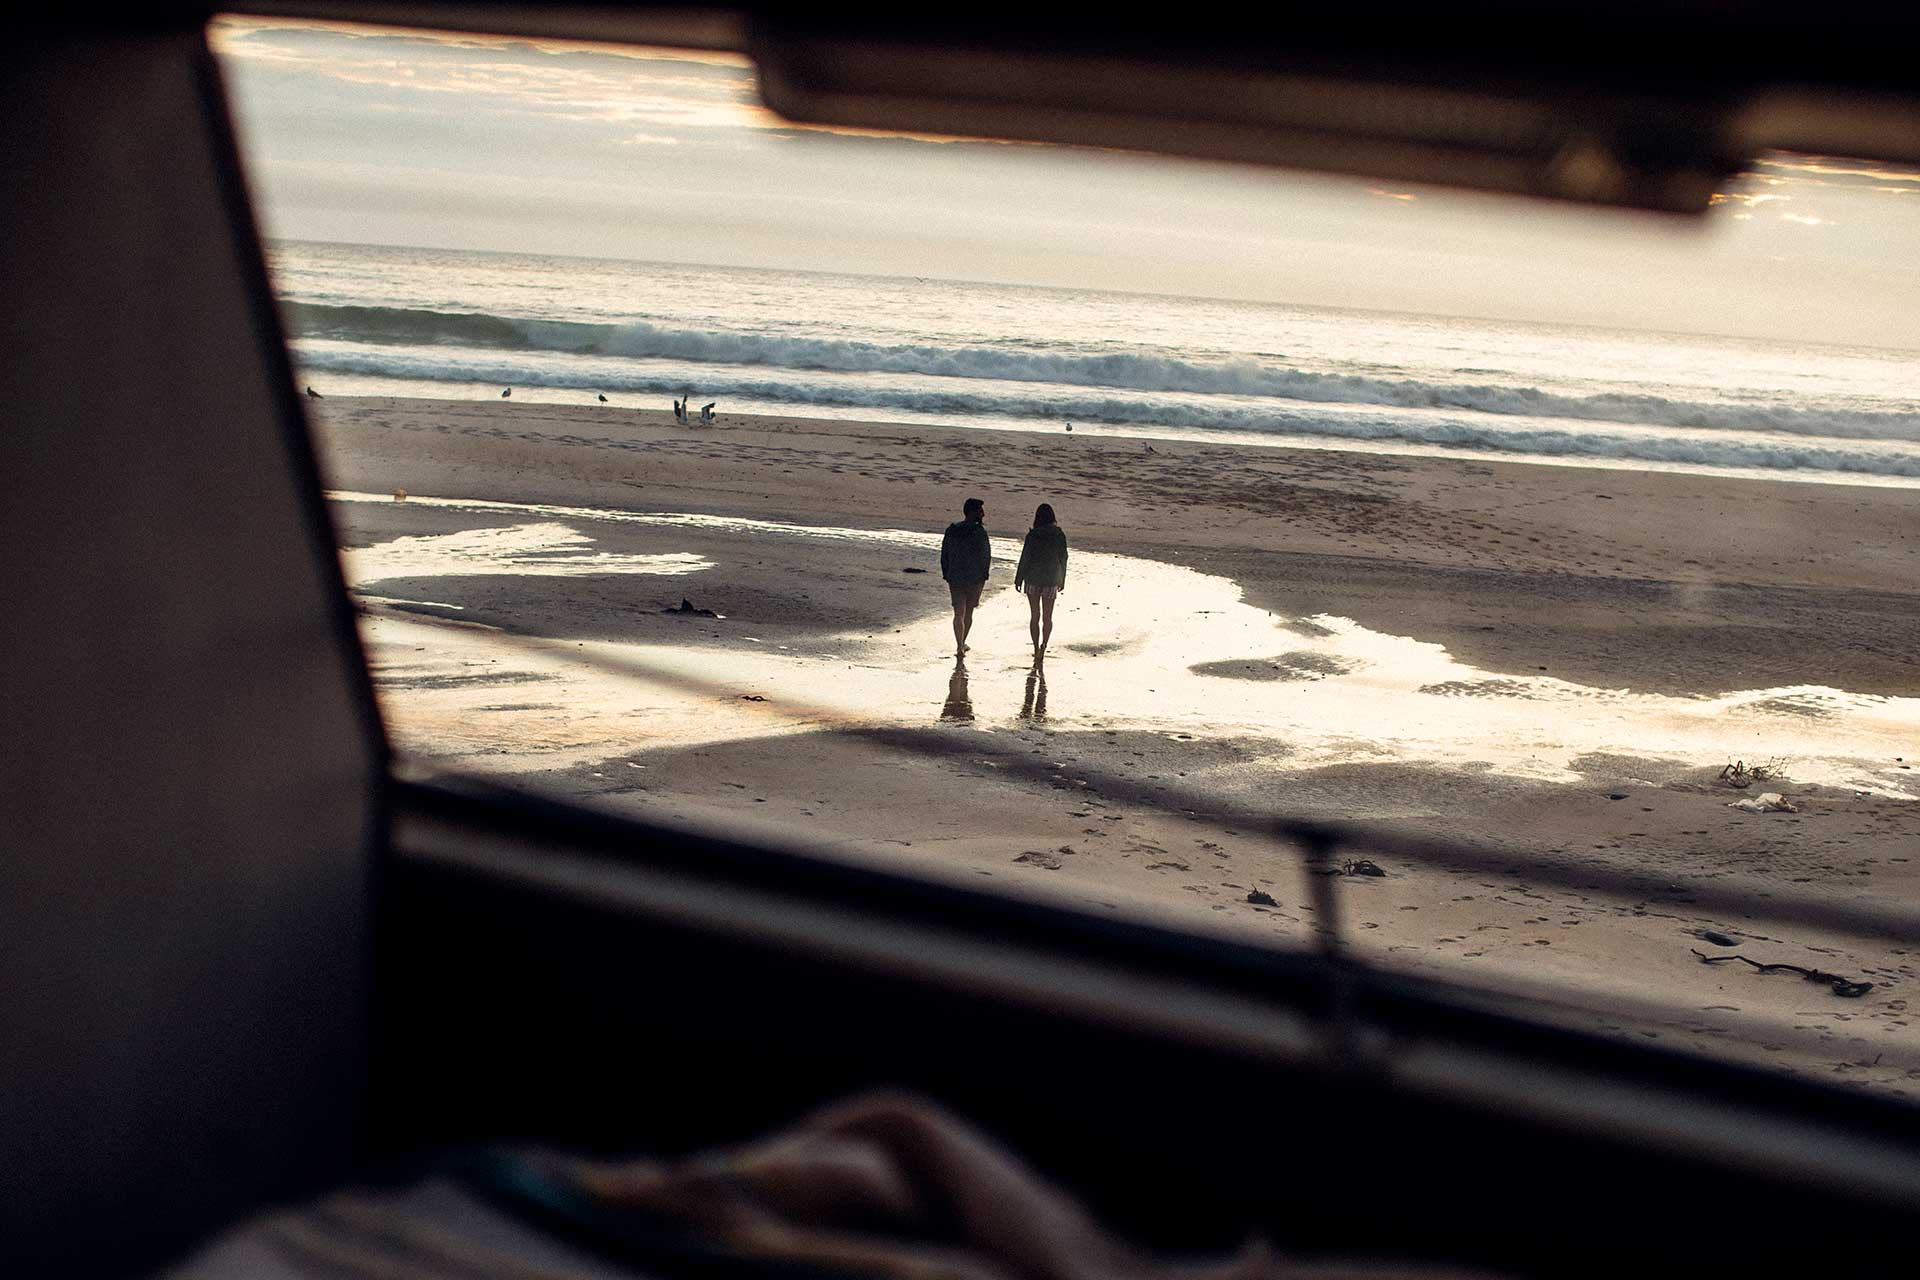 Sonnenuntergang Strand Meer Landschaft Südafrika Kapstadt Lifestyle Fotograf